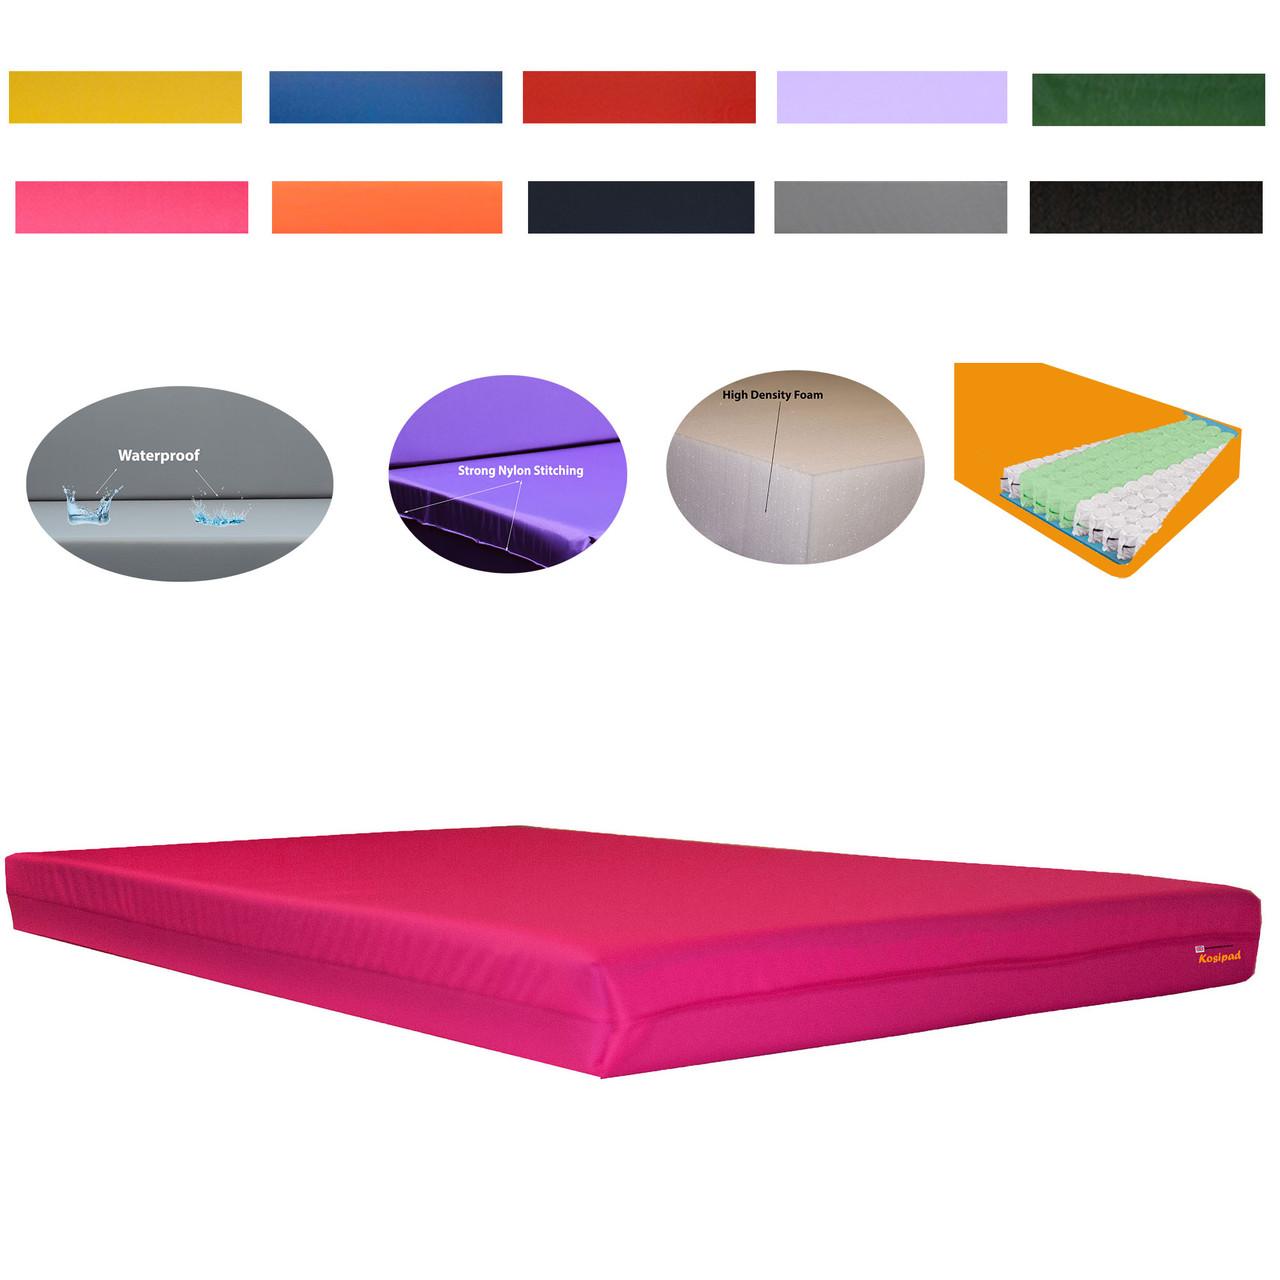 Kosipad 15cm Pocket Sprung Pink high imapct Gymnastics Crash pads